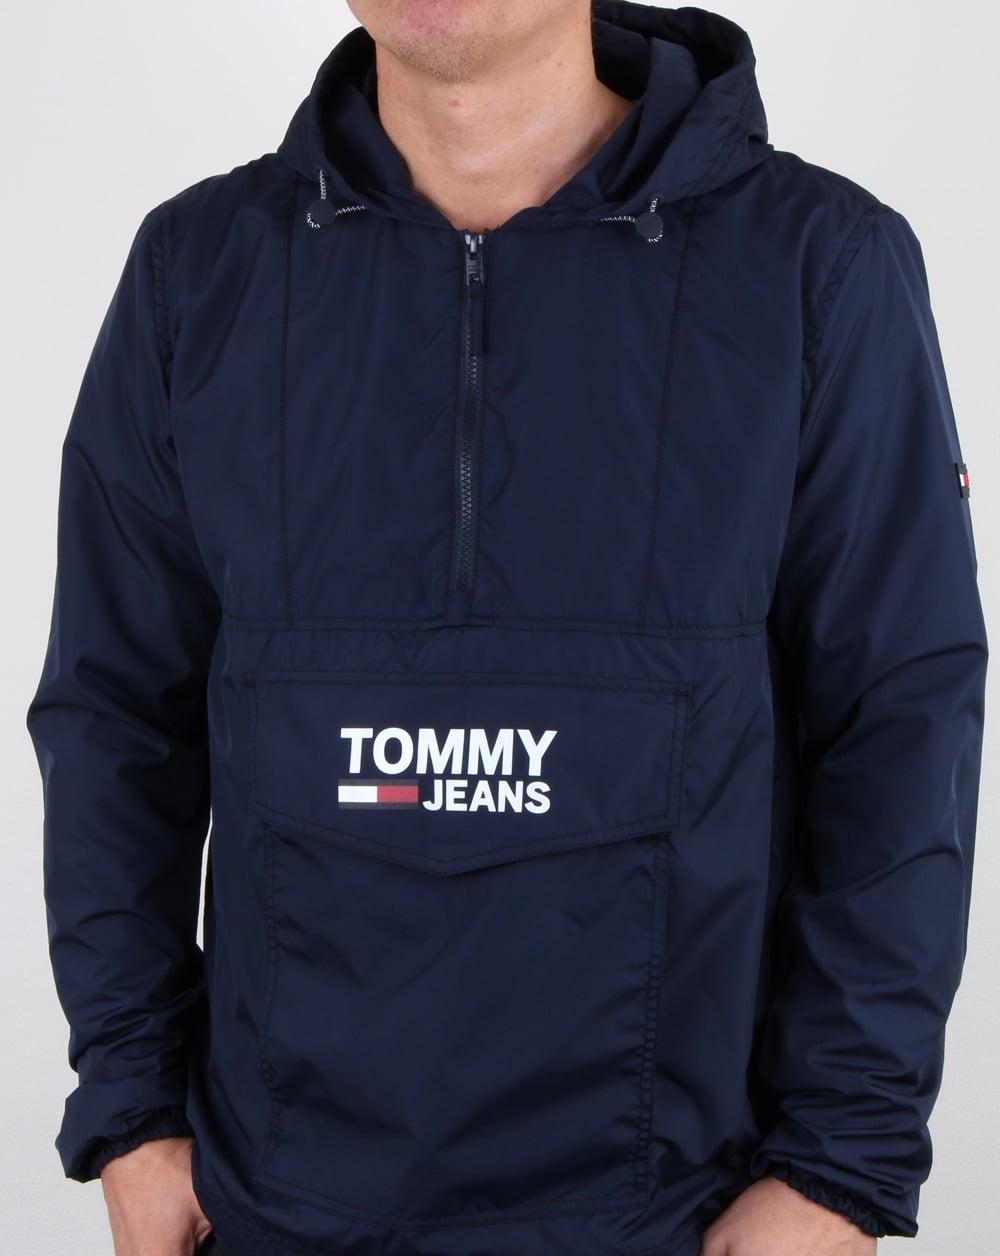 30493d20a7 Tommy Hilfiger Jeans Tommy Hilfiger Pop Over Anorak Navy